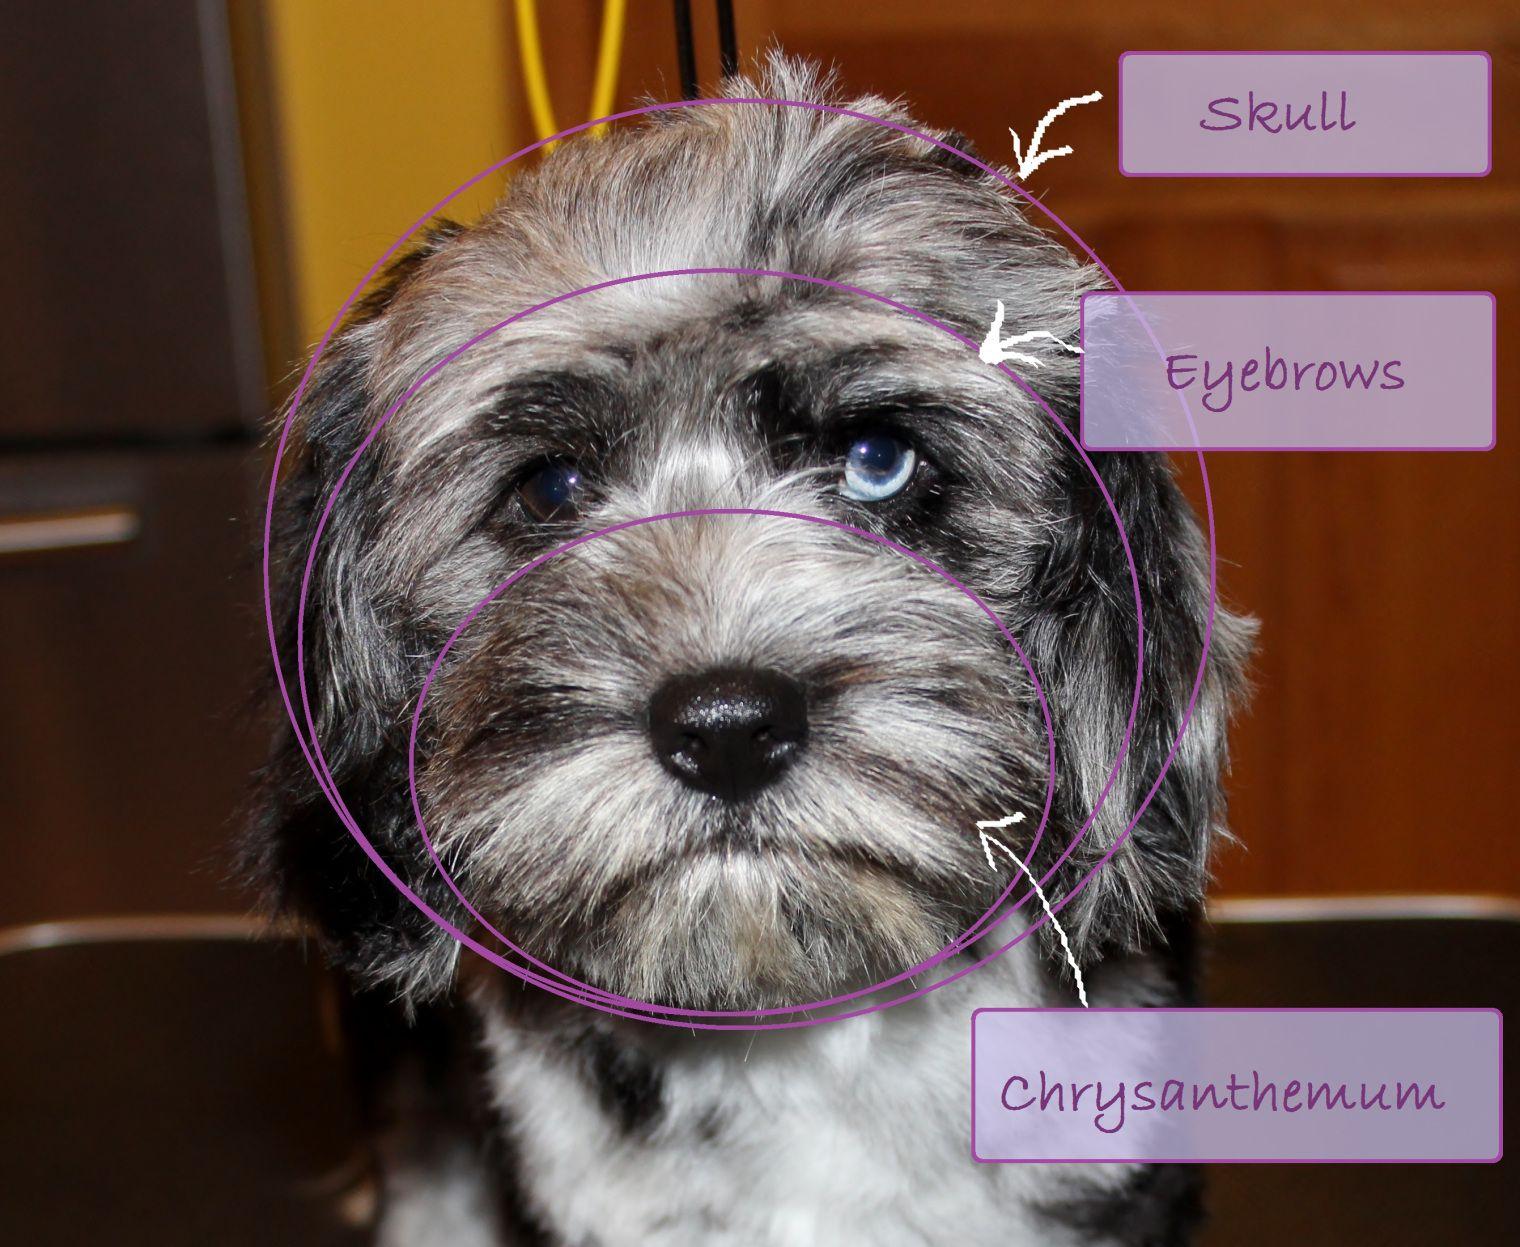 anatomy - all terms | Animals | Pinterest | Anatomy, Pet grooming ...